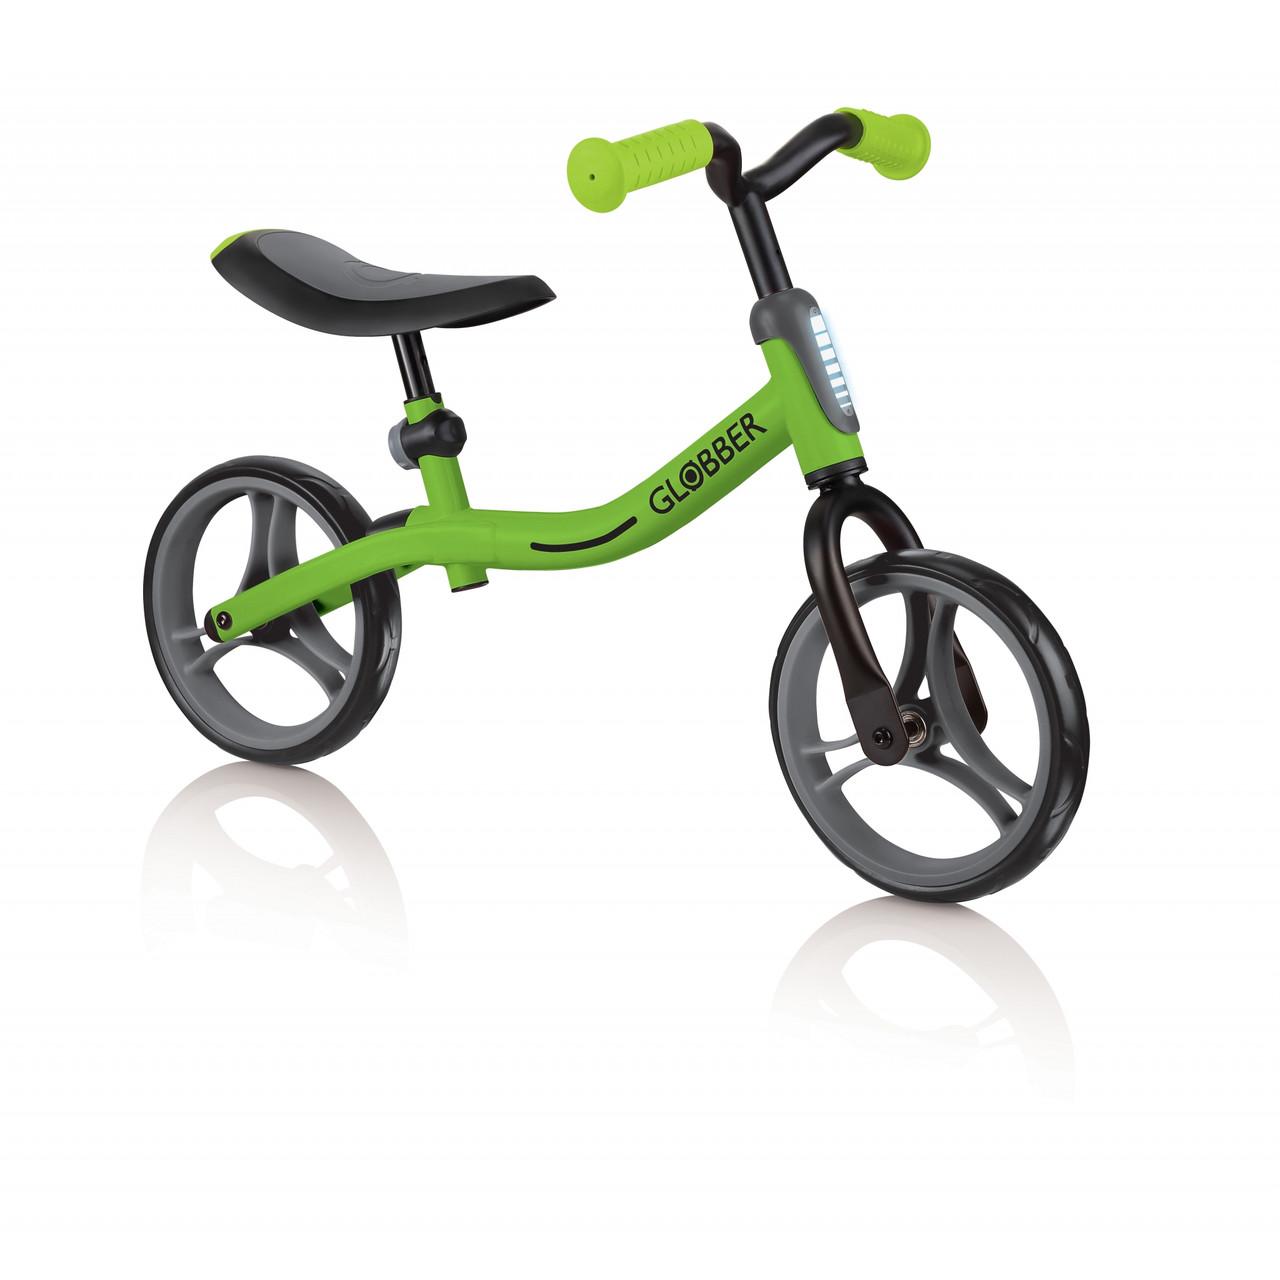 Беговел Globber GO BIKE зеленый, от 2-х лет до 20 кг. (610-136)